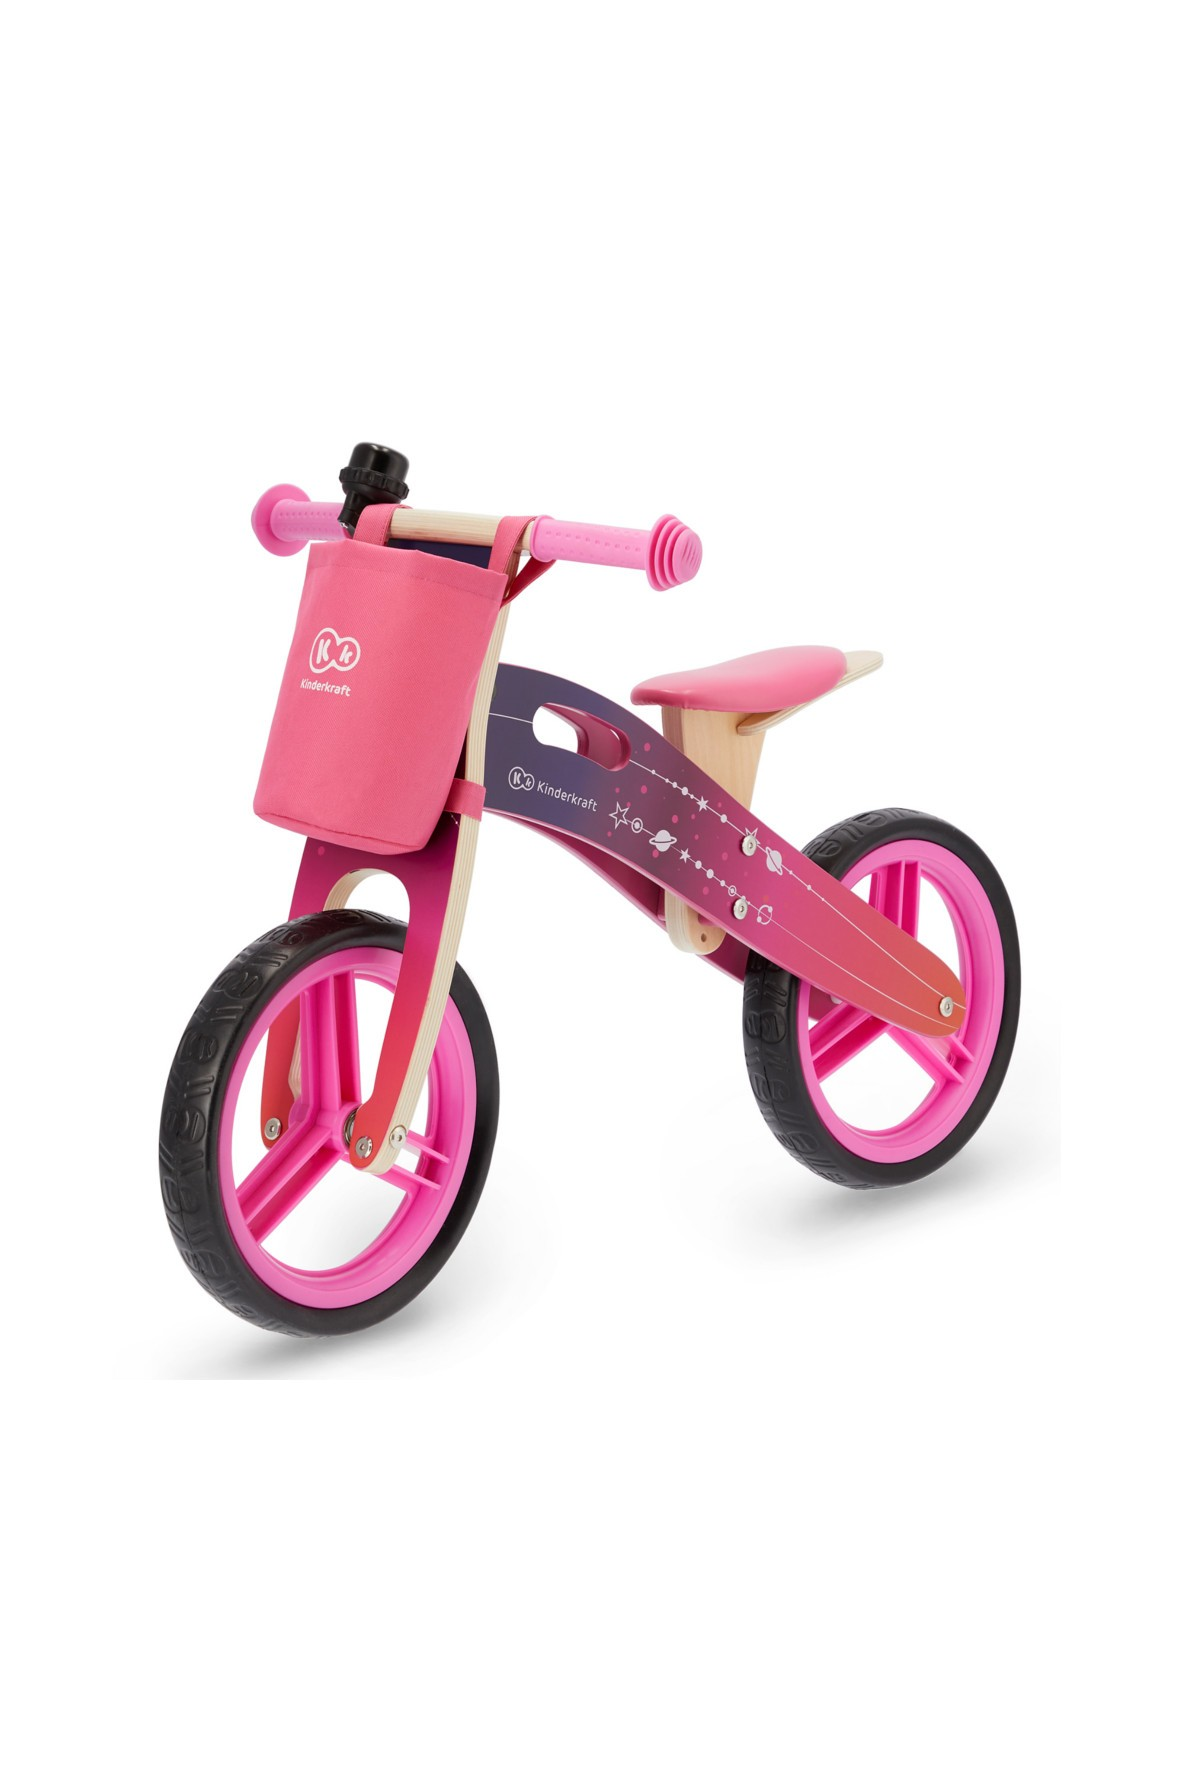 Rowerek biegowy Runner Galaxy róż z akcesoriami Kinderkraft